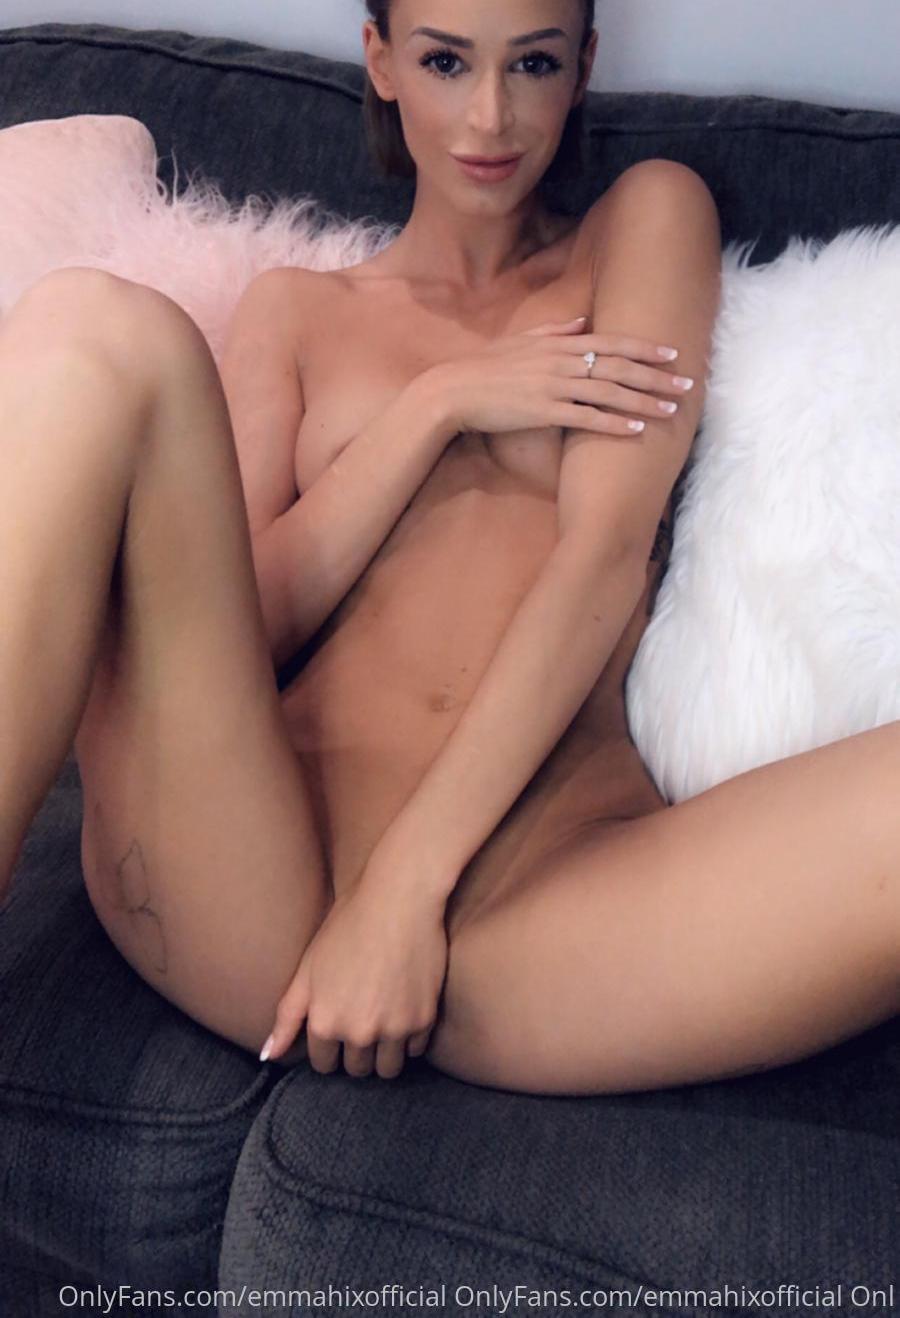 Emma Hix Emmahixofficial Onlyfans Nudes Leaks 0036